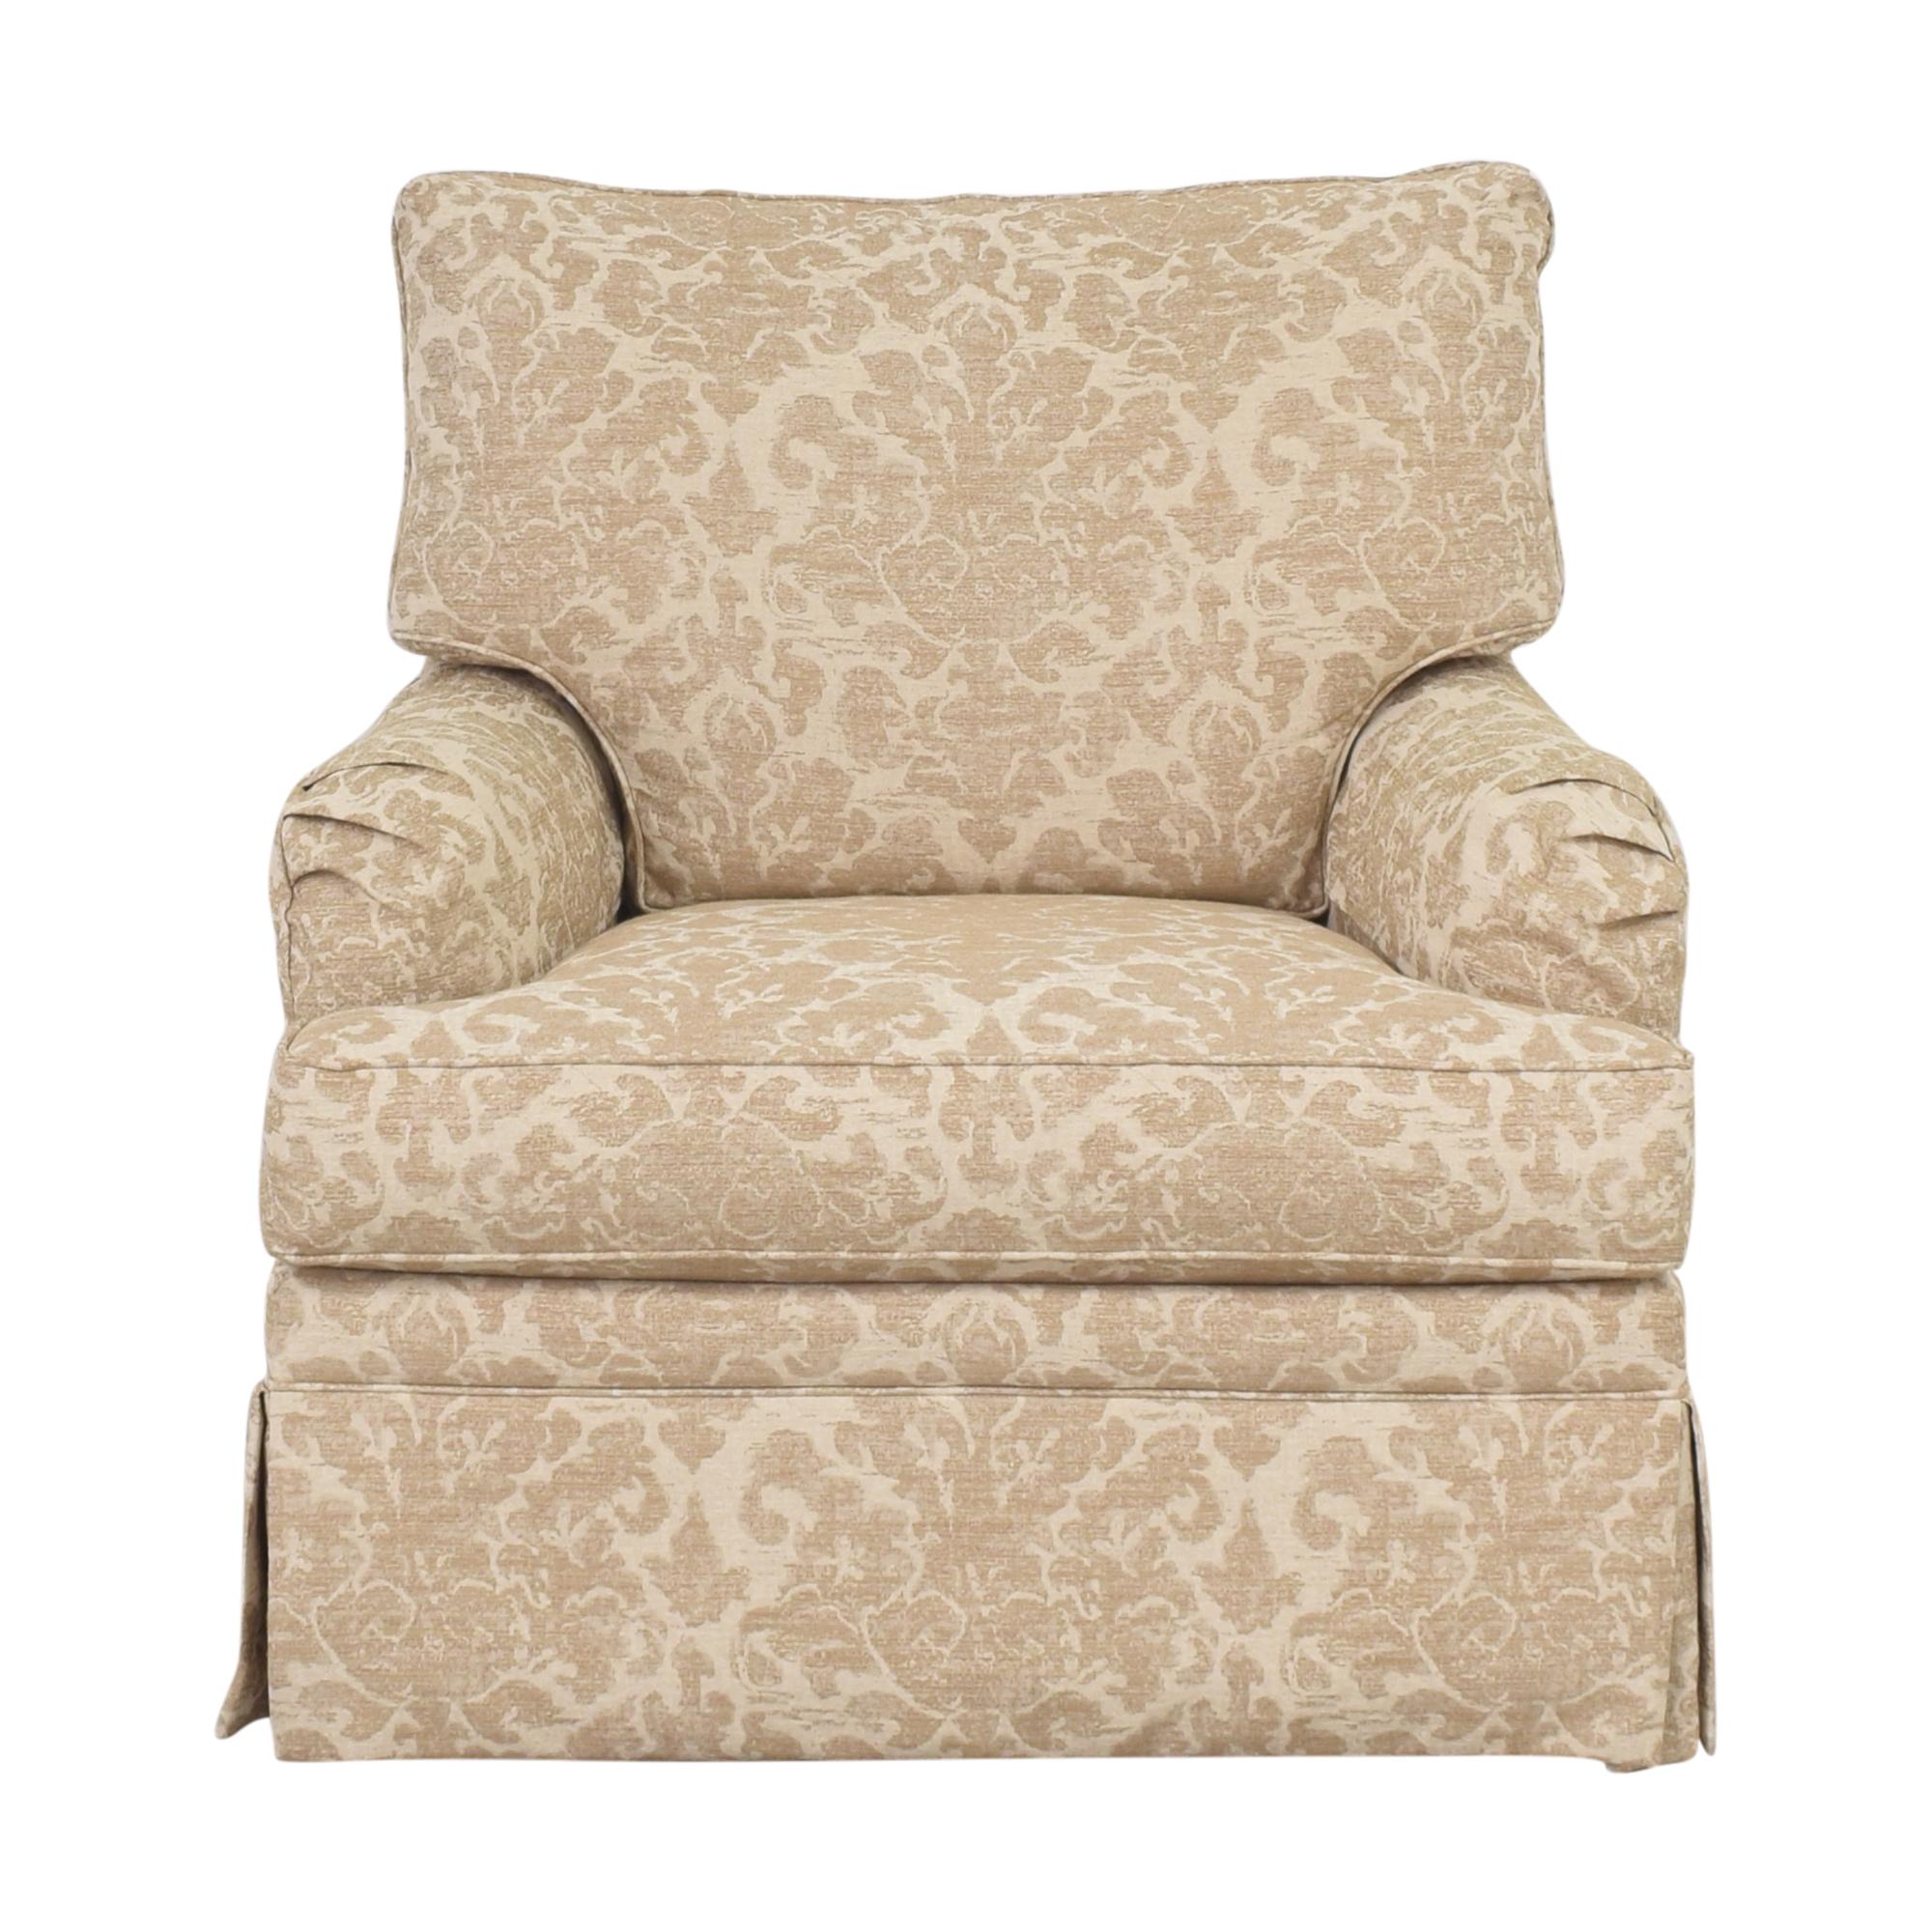 Ethan Allen Ethan Allen Chandler Accent Chair on sale